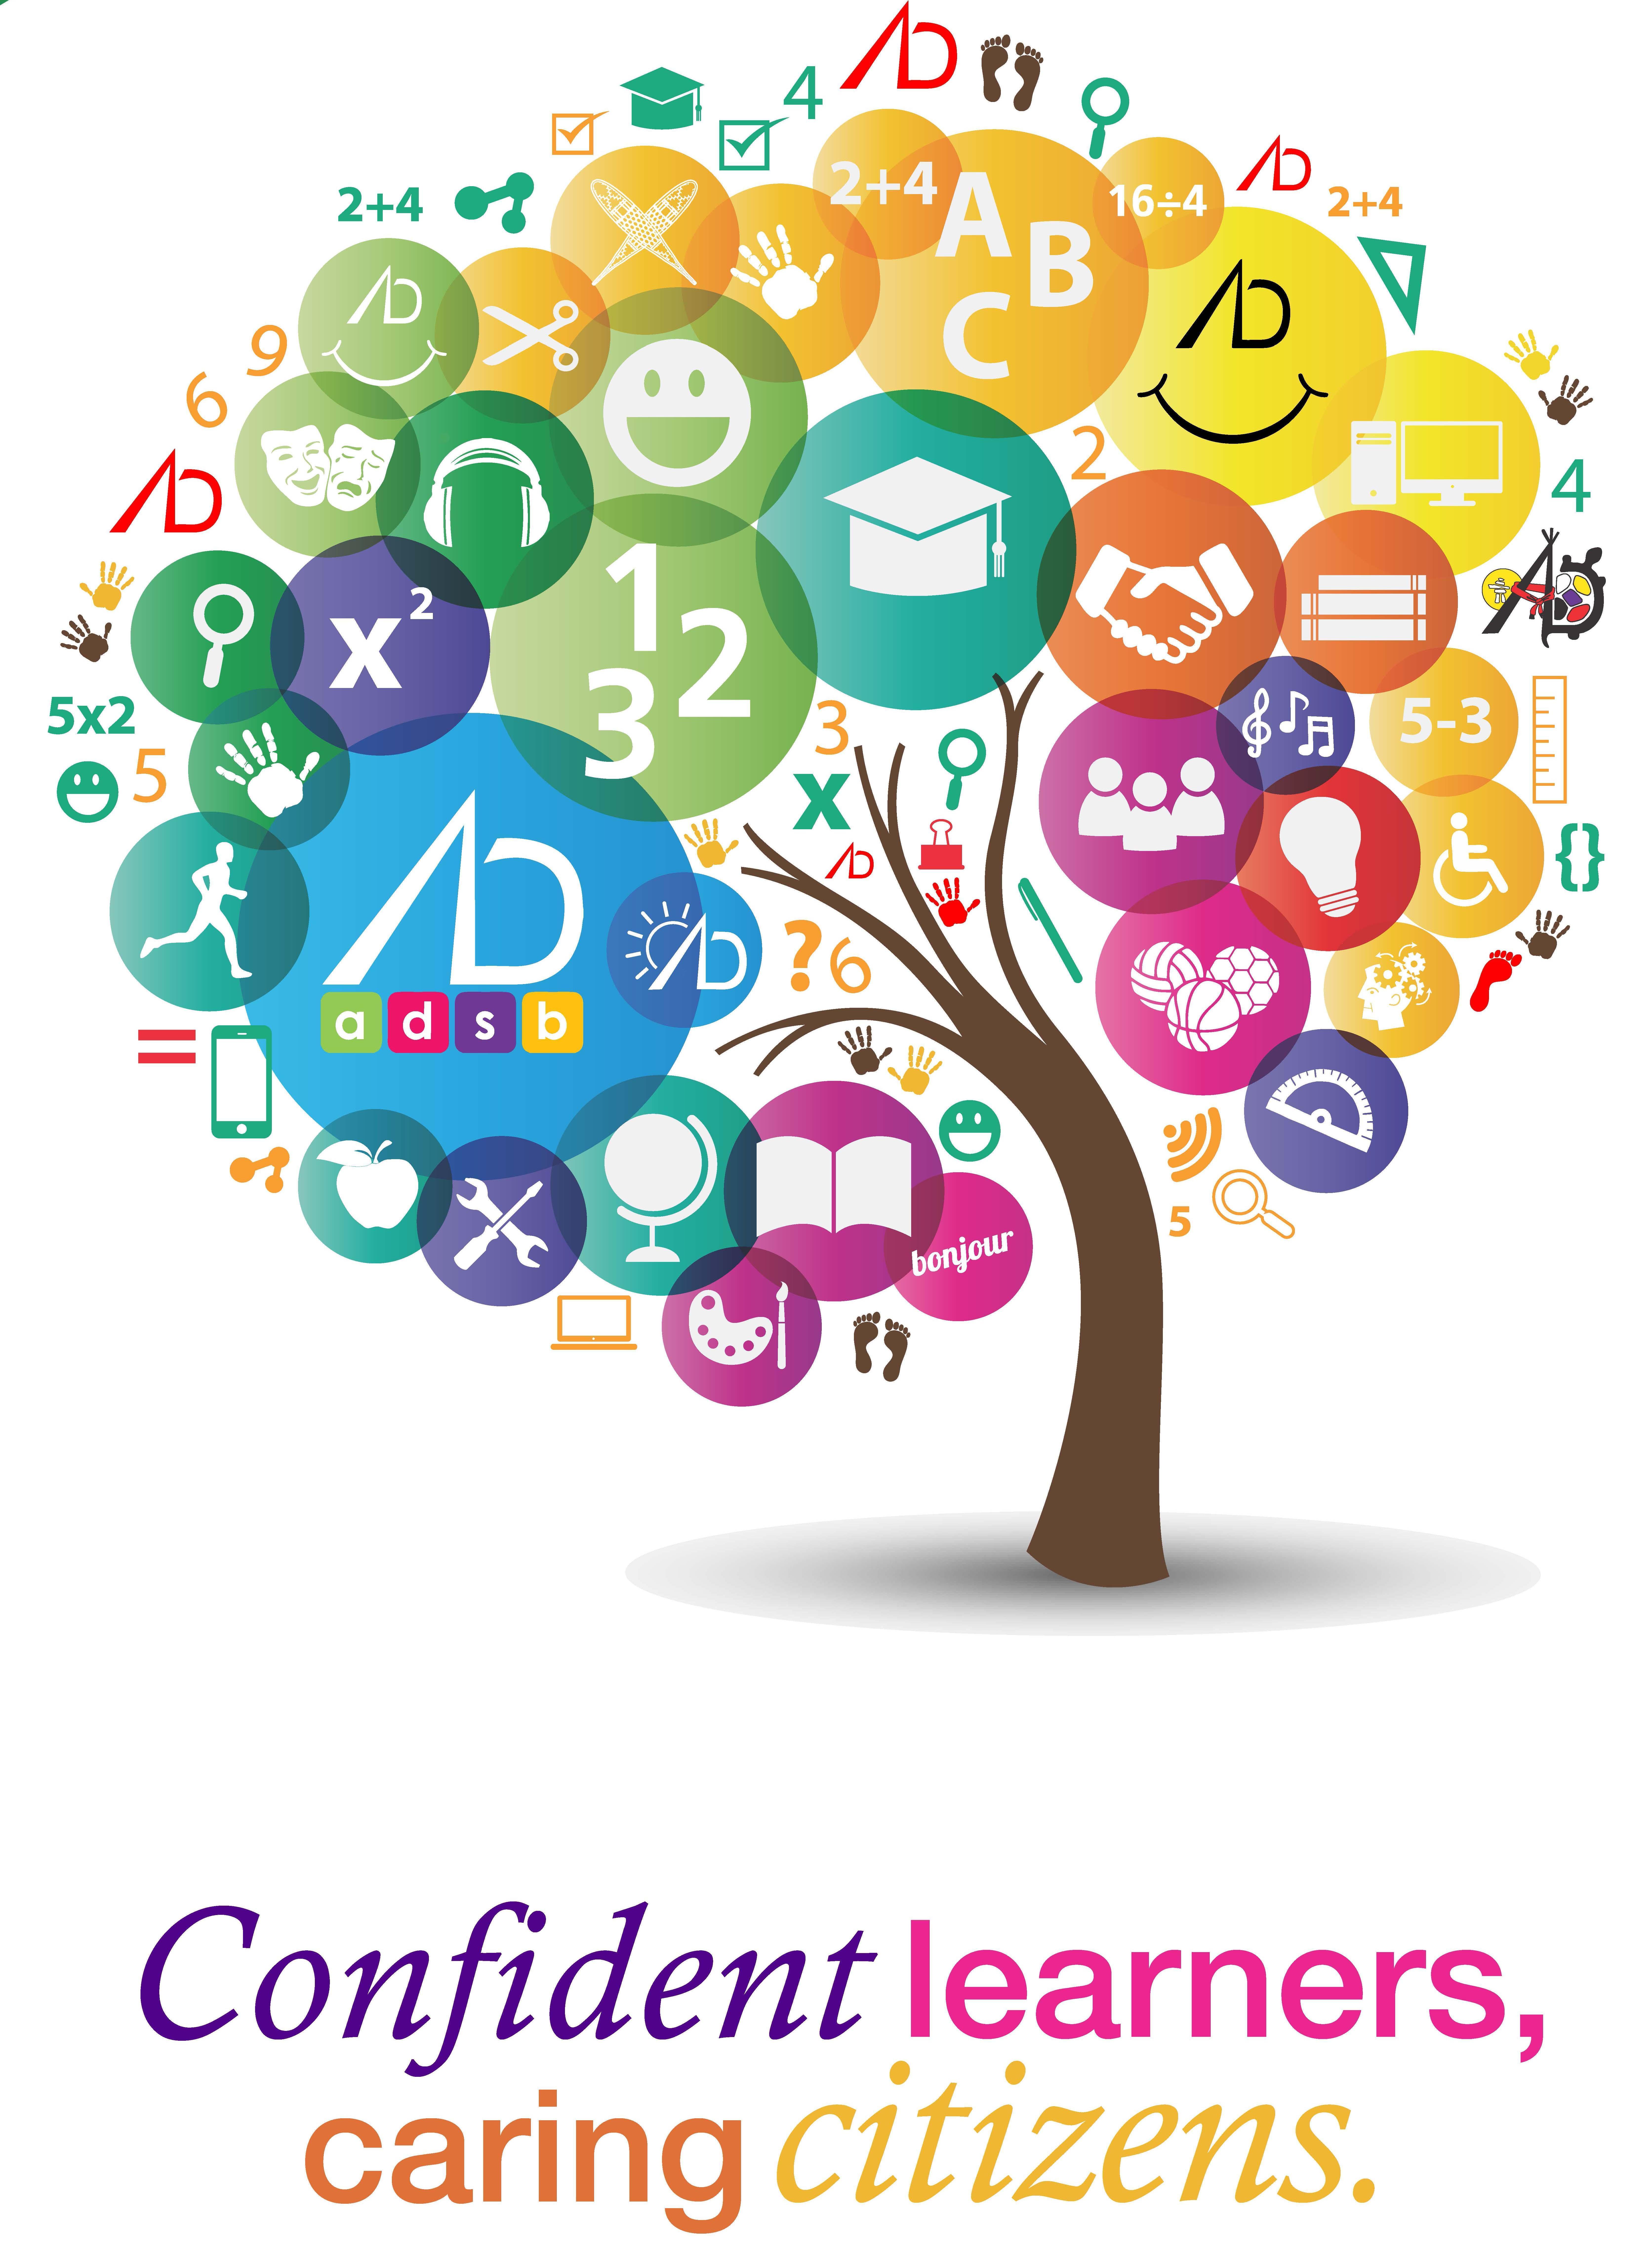 ADSB Tree Logo